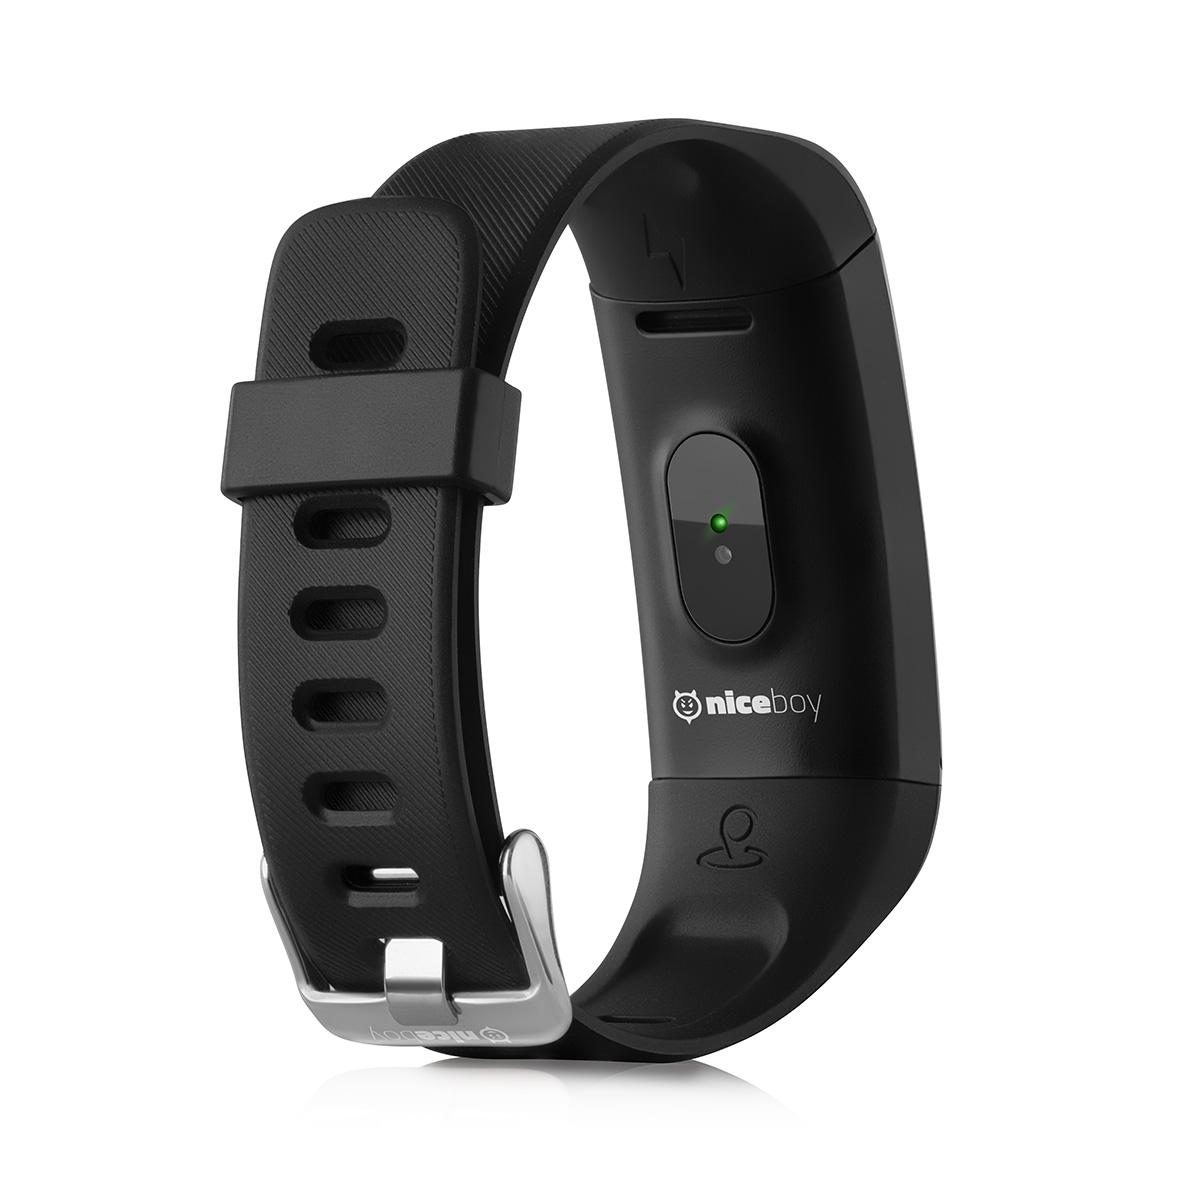 Chytrý náramek Niceboy® X-fit GPS černá